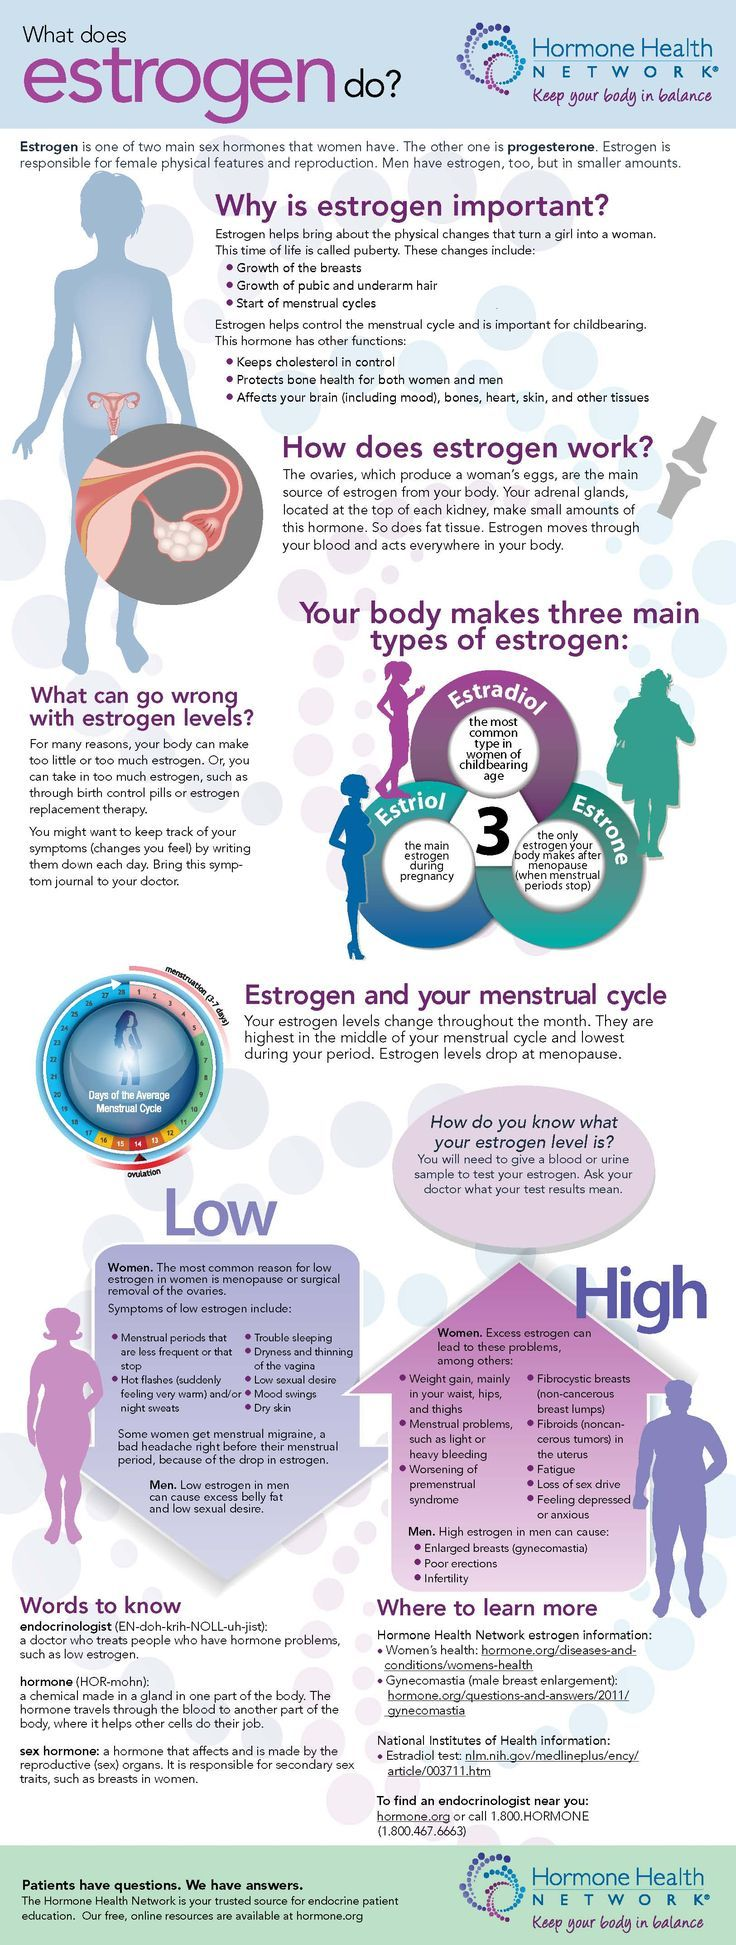 what does estrogen do?